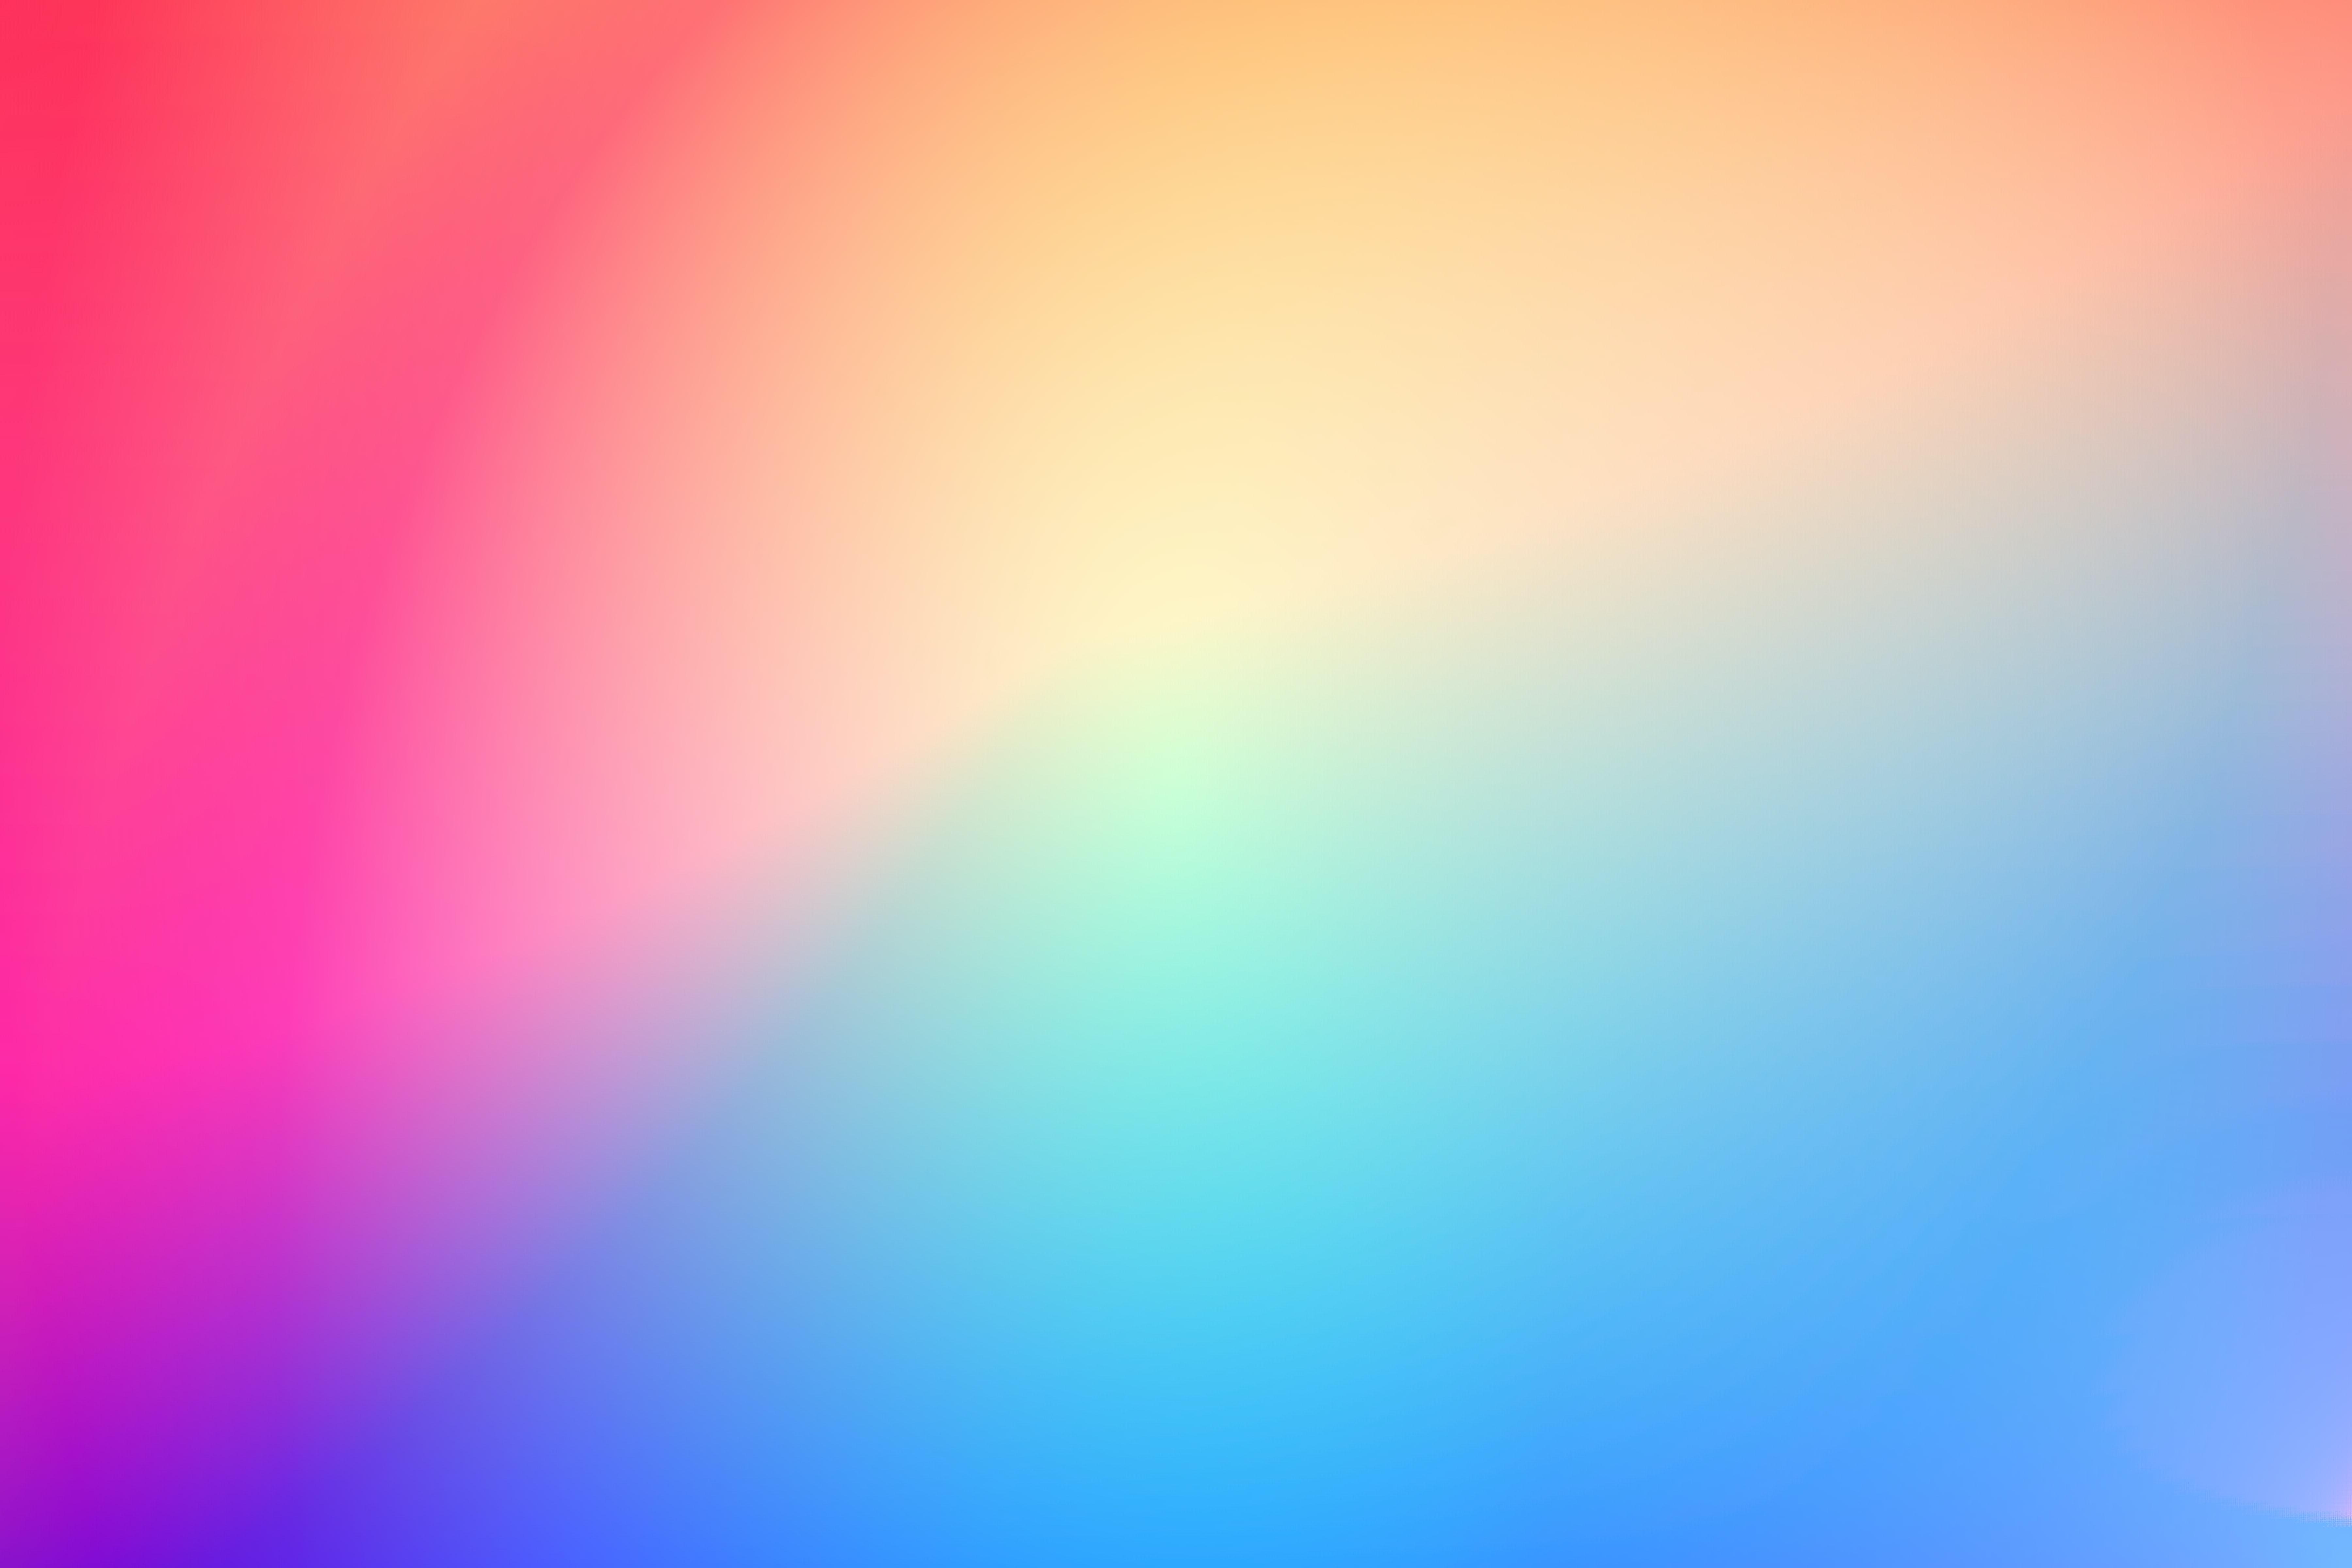 Multi-colored gradient